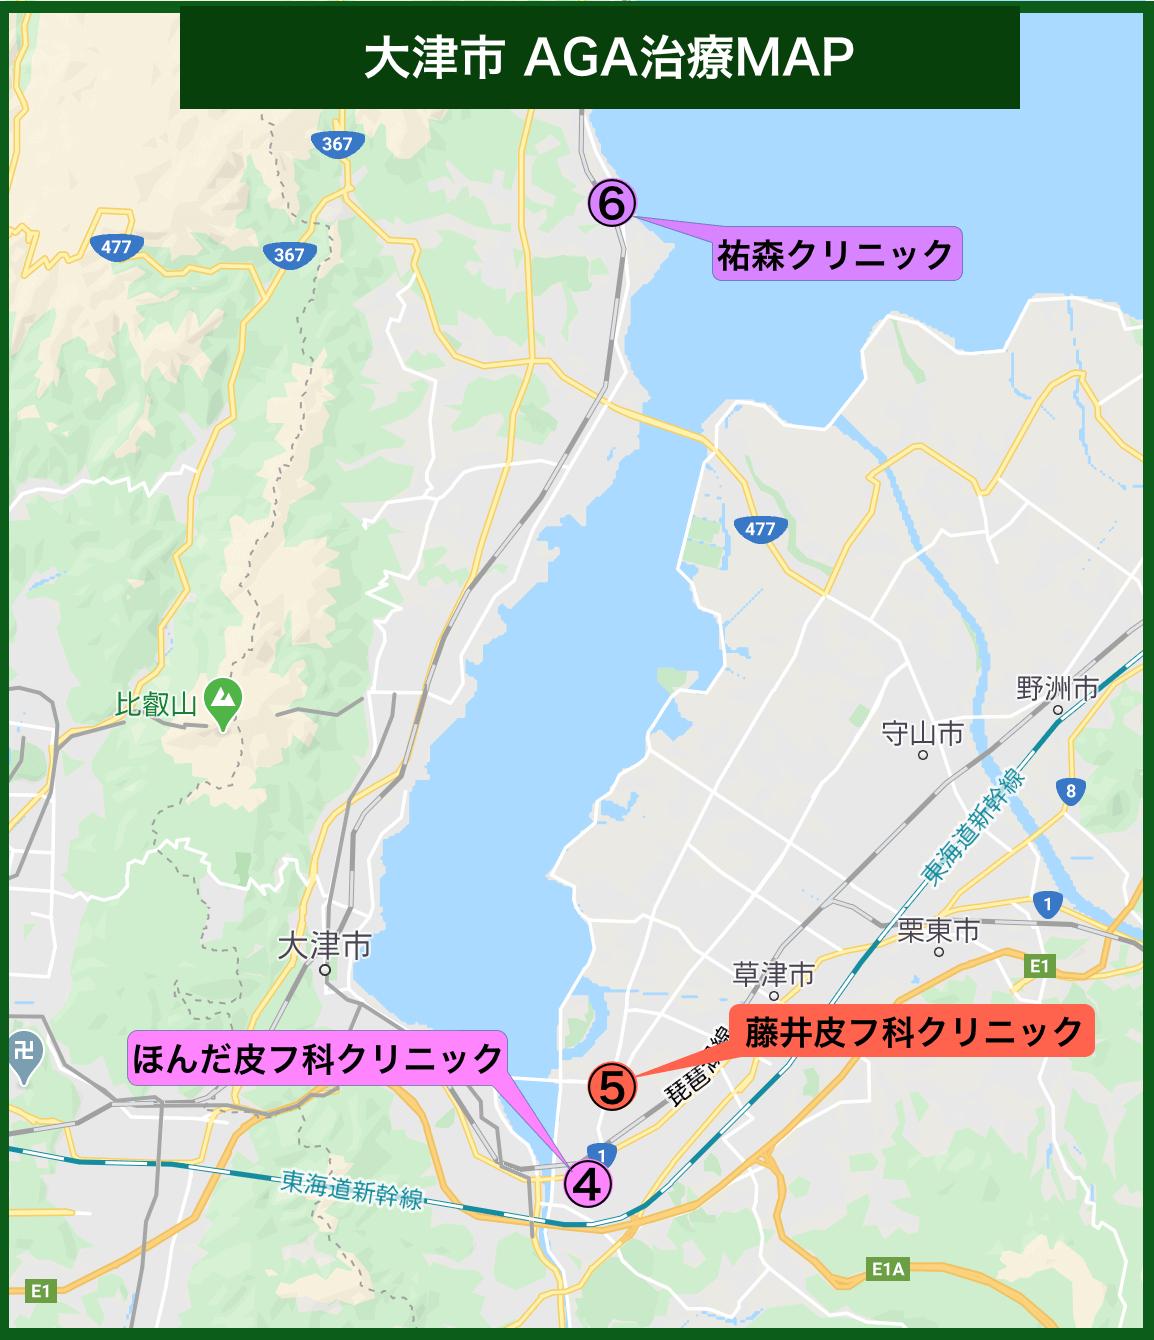 大津市 AGA治療MAP